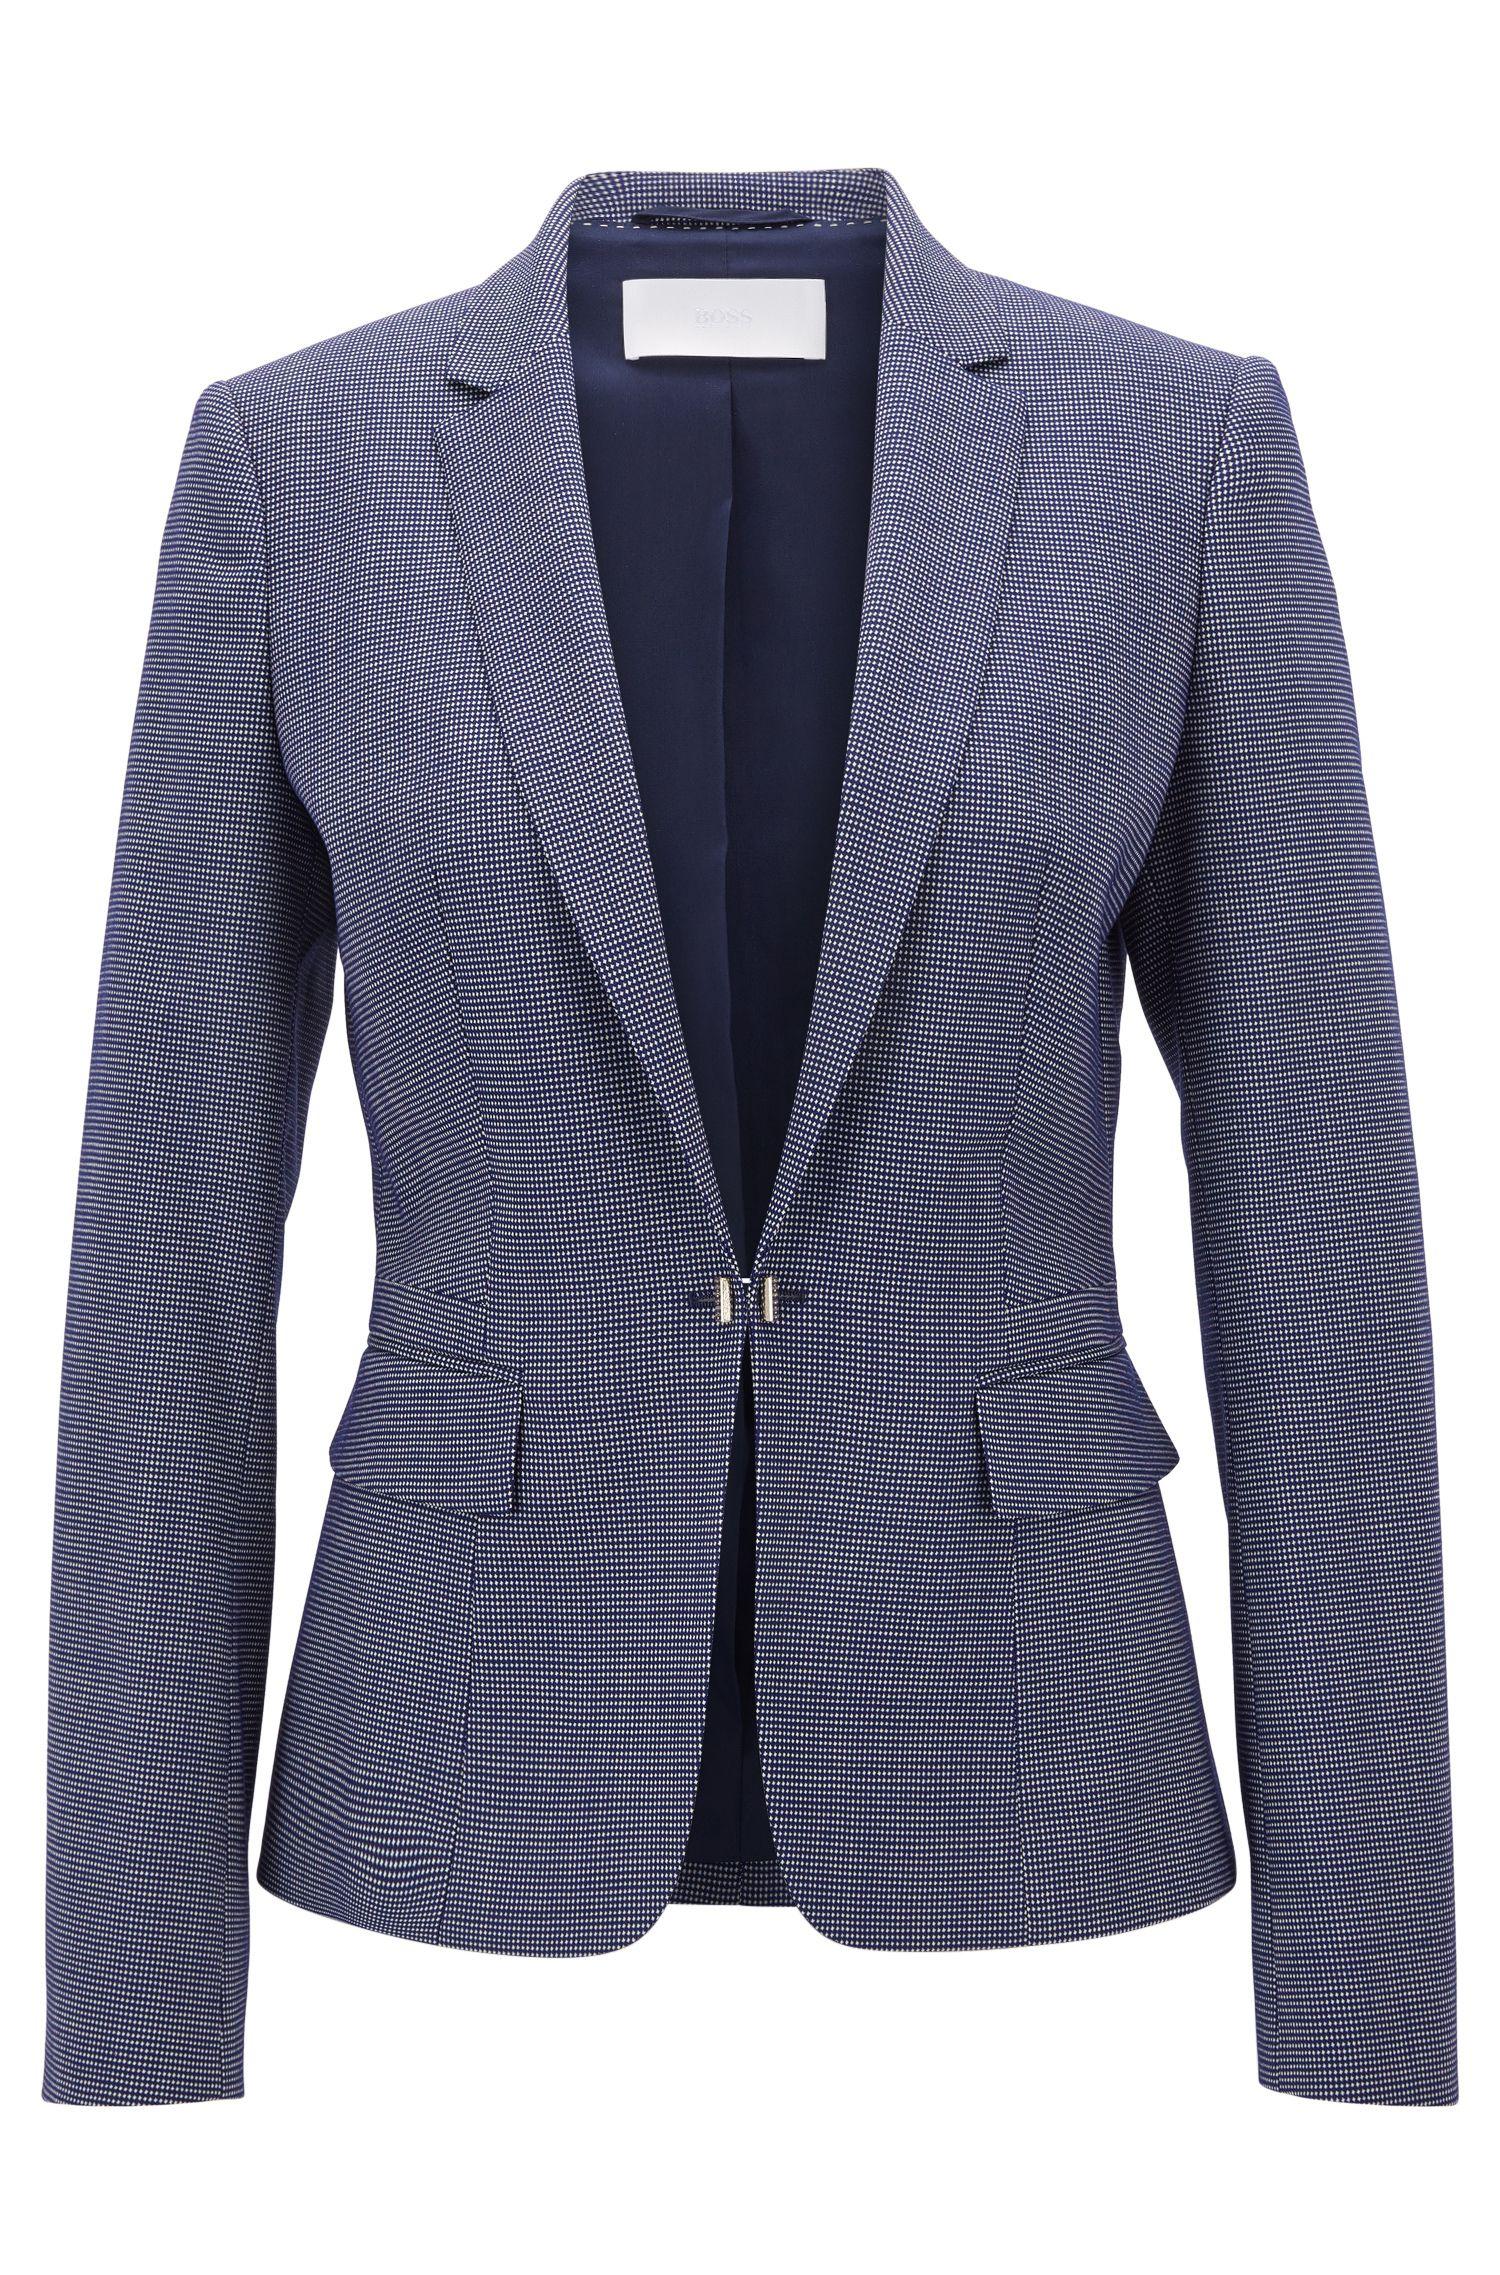 Stretch Virgin Wool Jacket | Jaflink , Patterned